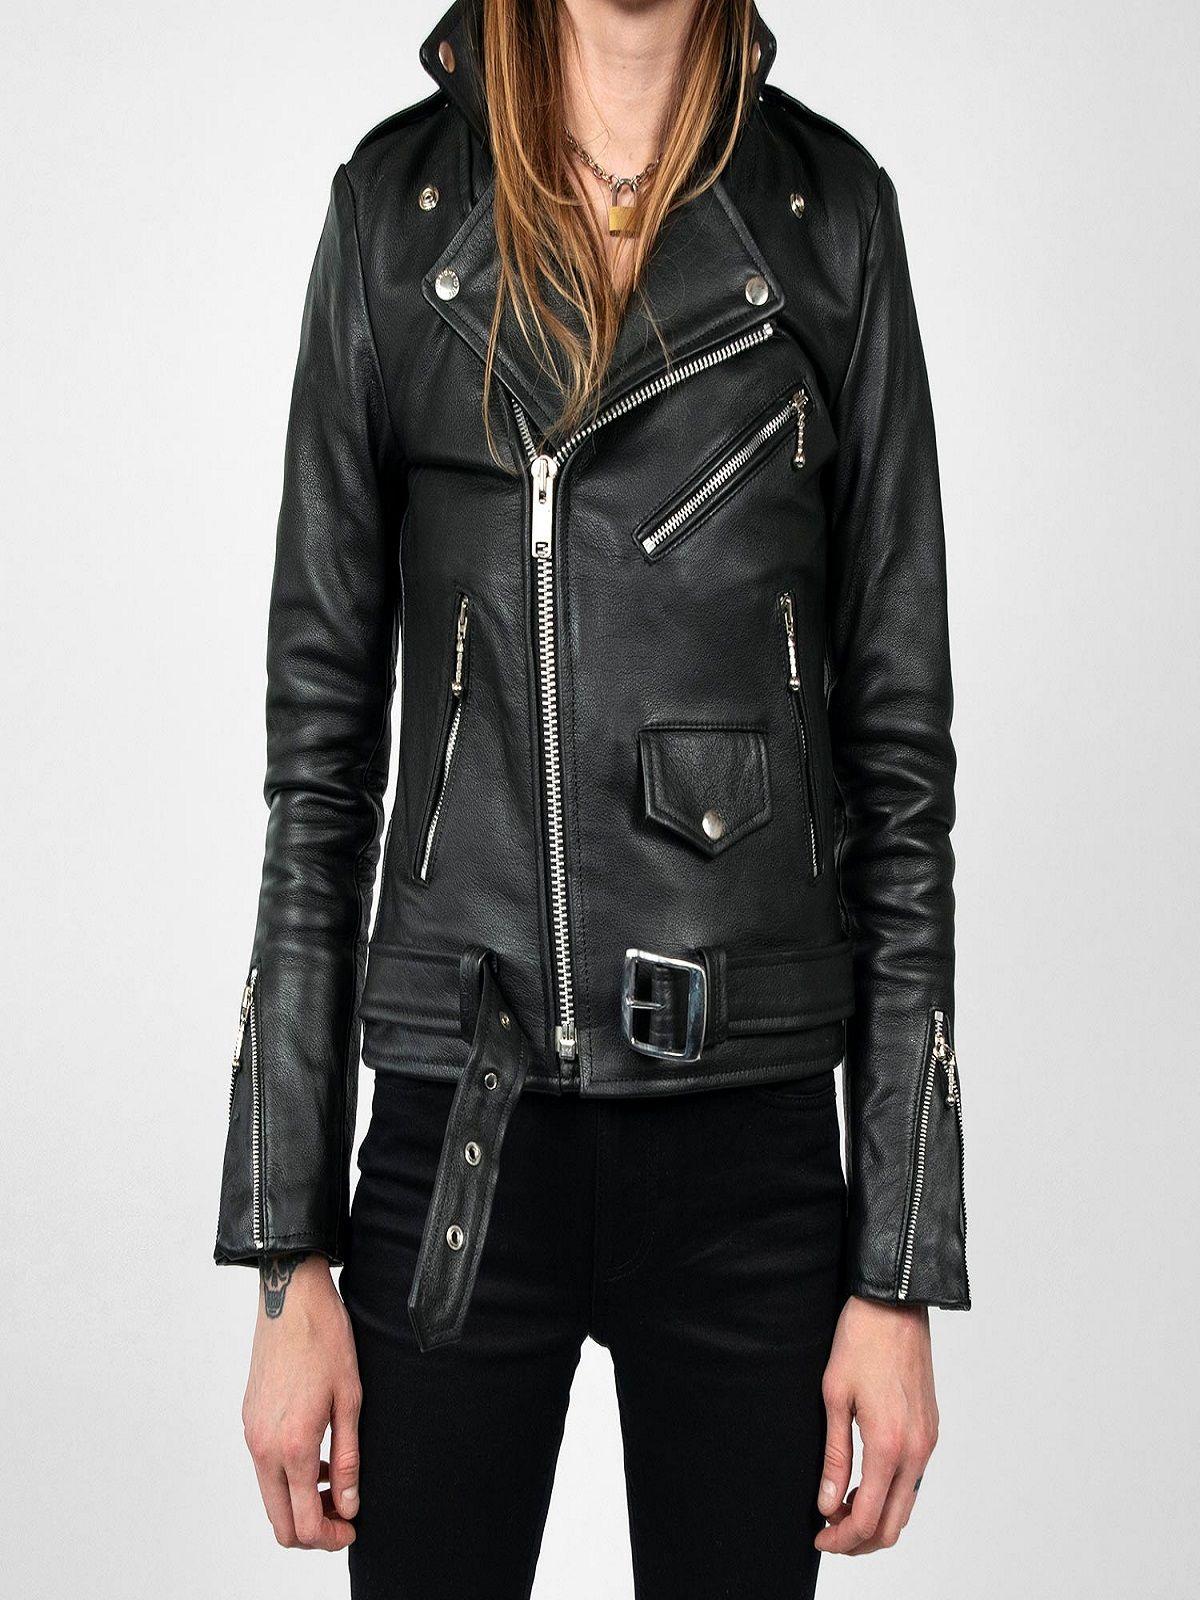 Trending Black Biker Jacket For Women Women Jacket Mauvetree Womens Black Jacket Womens Black Leather Jacket Black Biker Jacket [ 1600 x 1200 Pixel ]